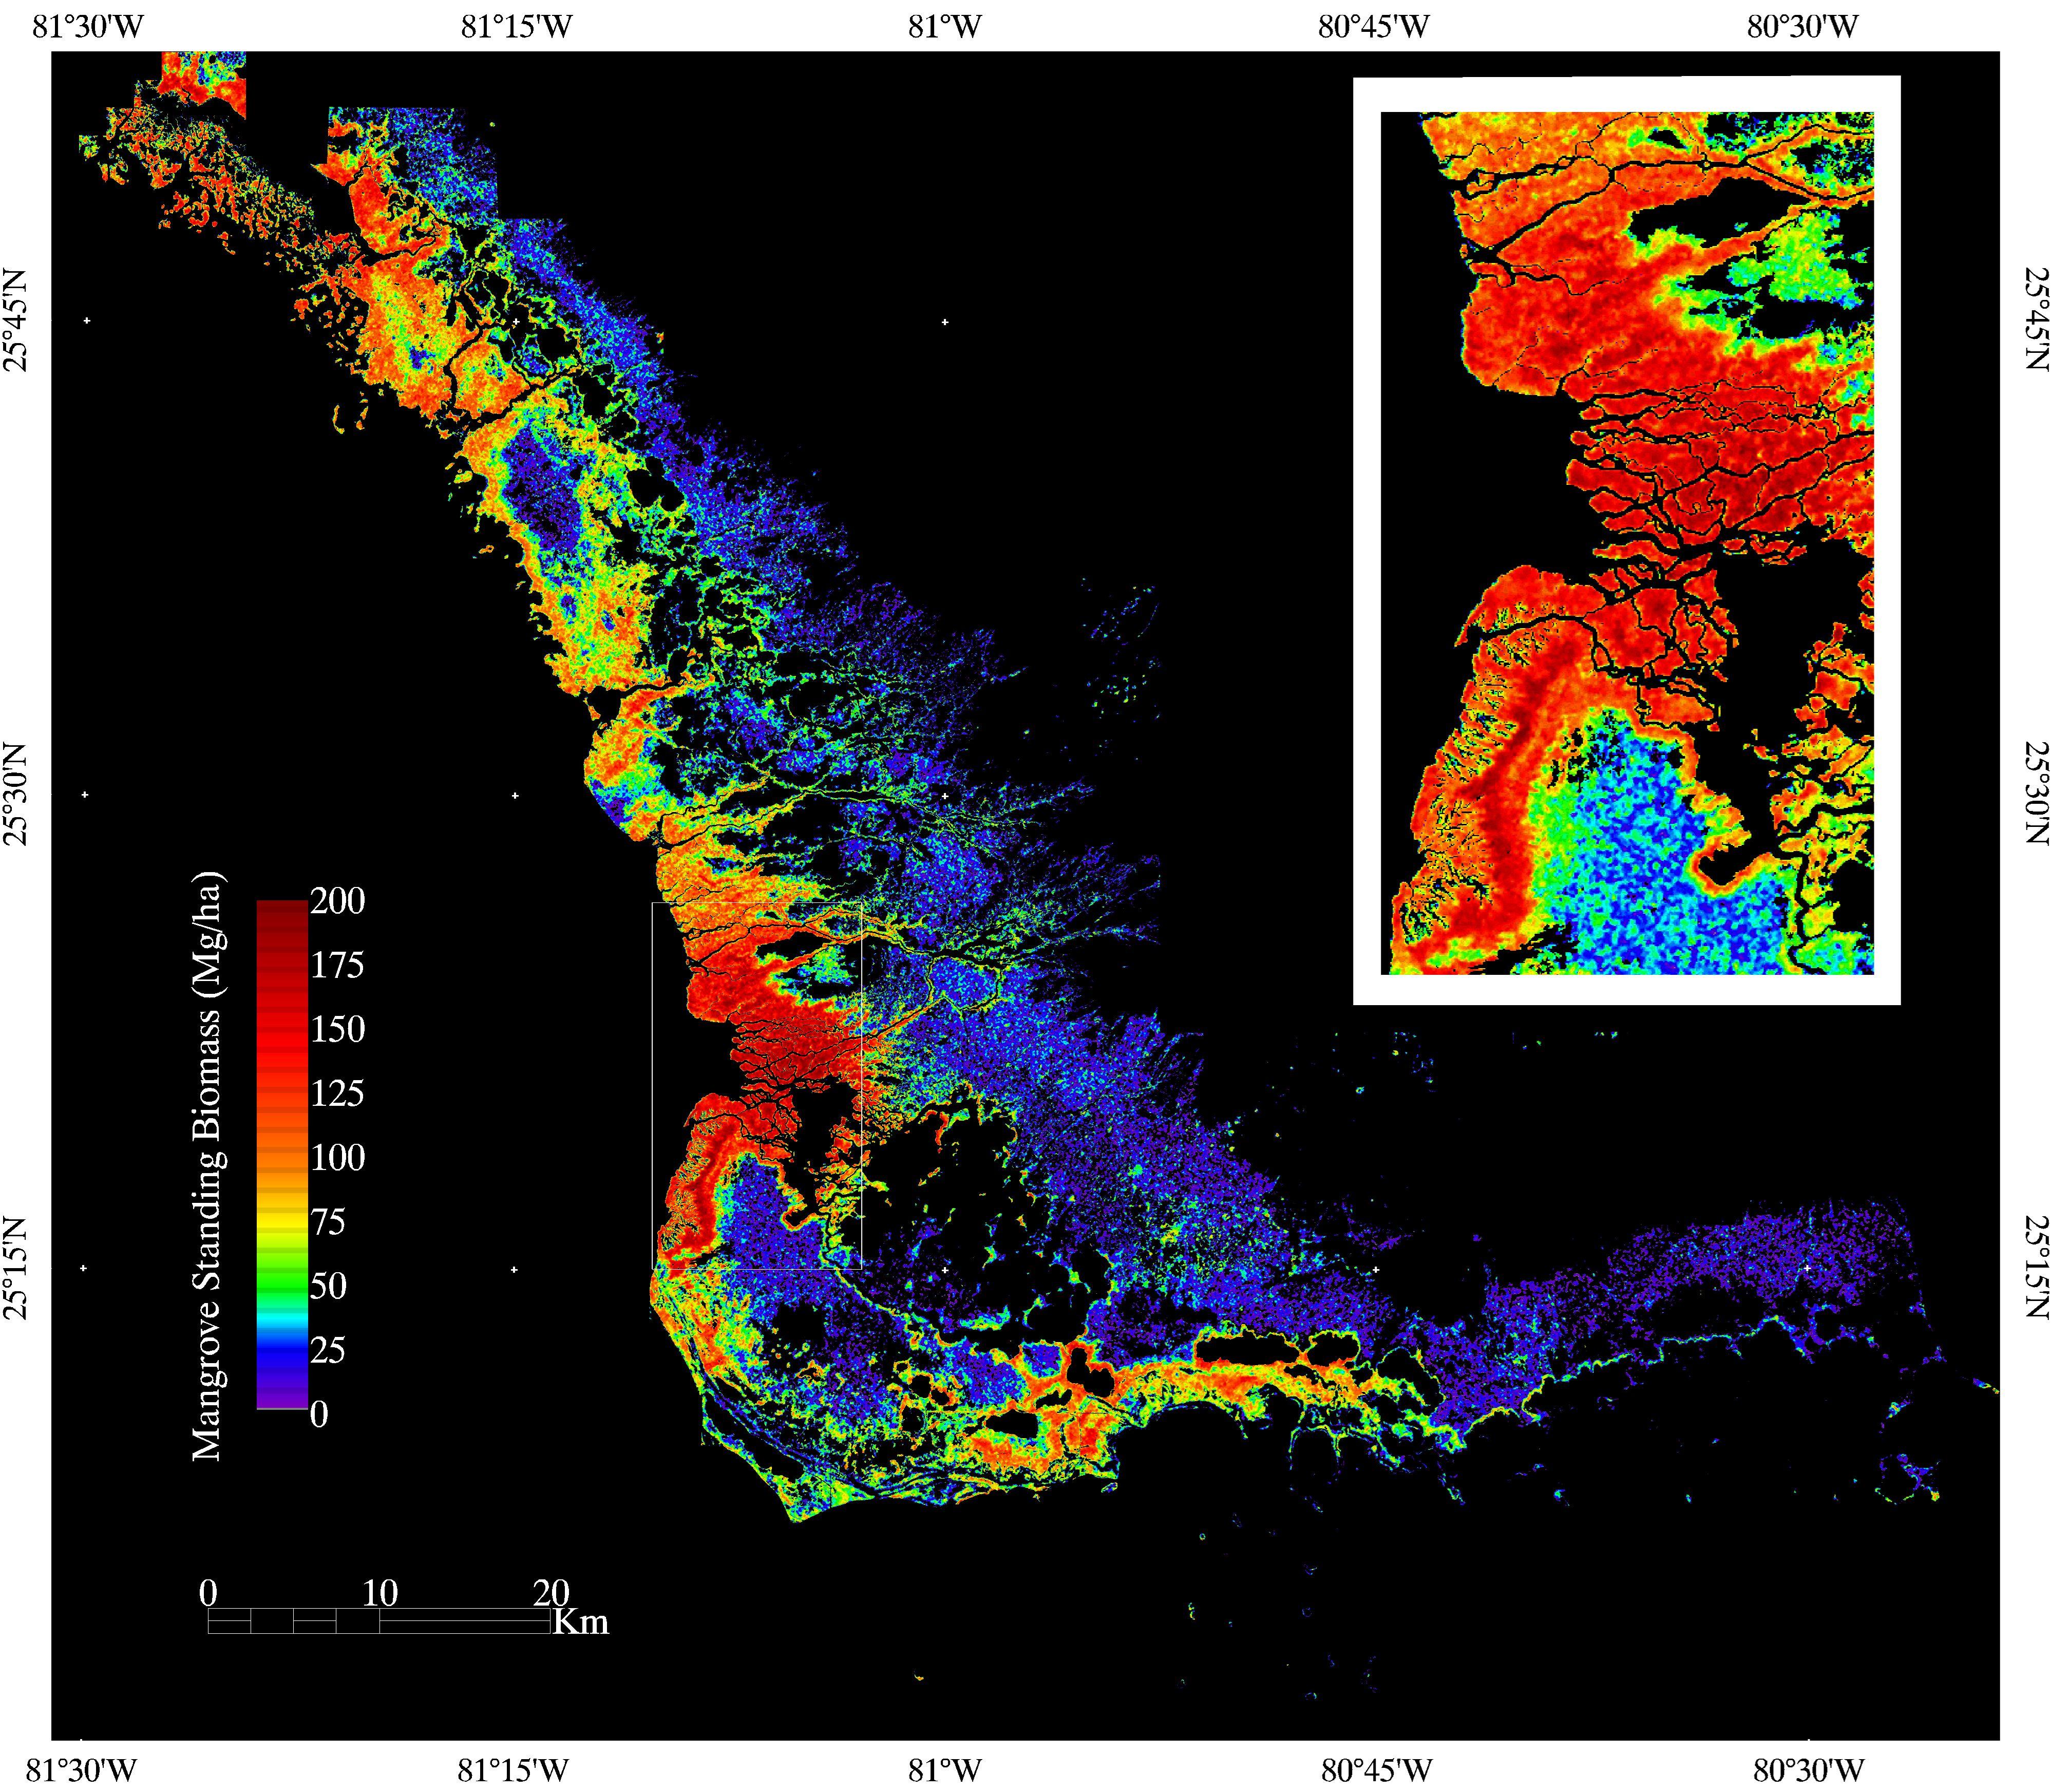 Florida Coastal Everglades Lter - Gis Data And Maps - Interactive Elevation Map Of Florida